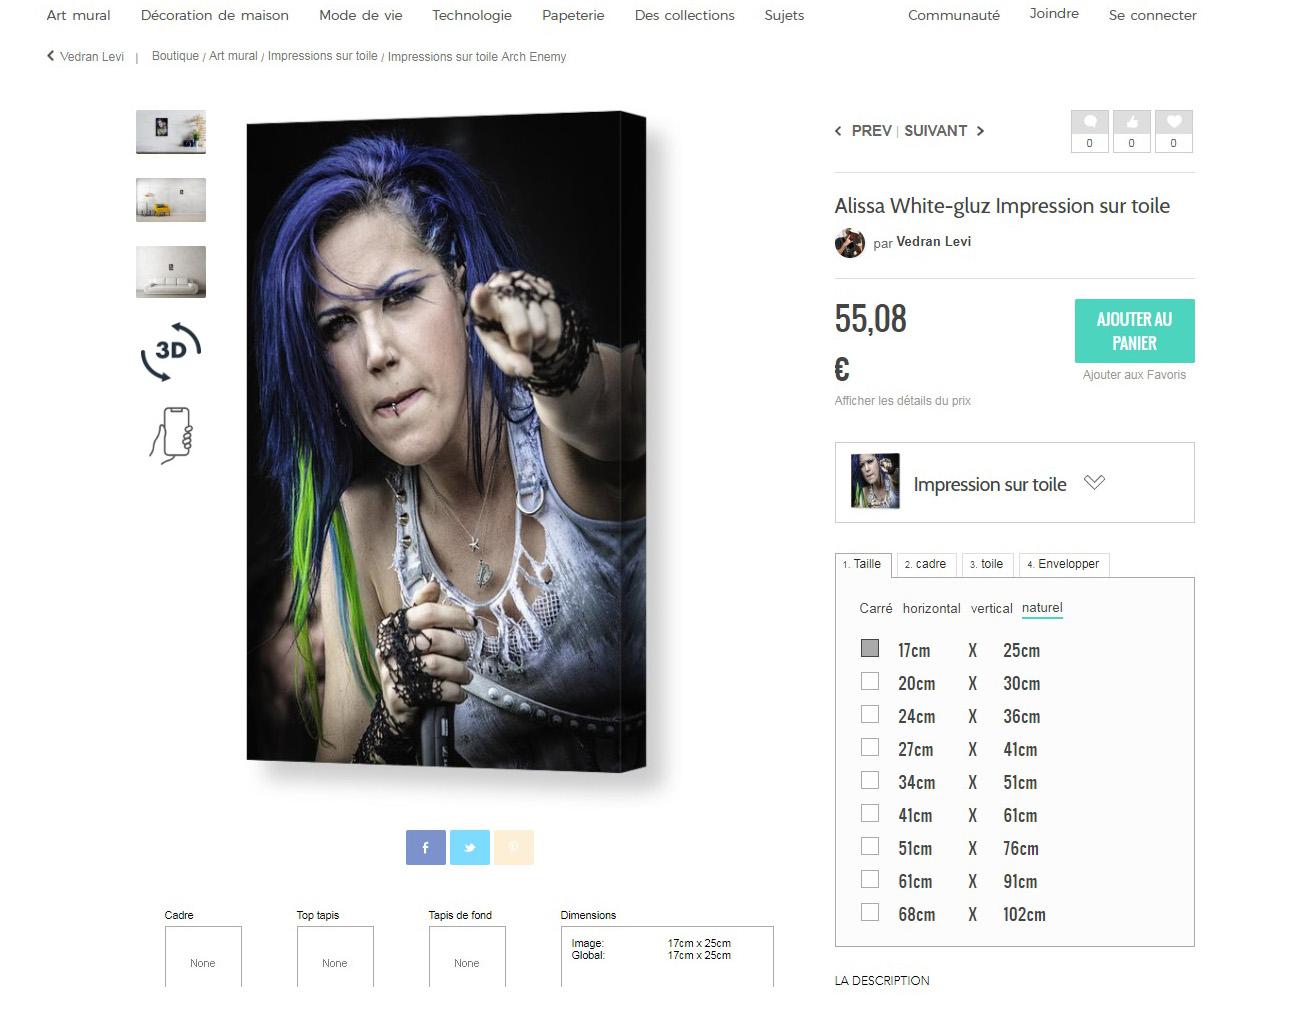 Impression sur toile ALISSA WHITE-GLUZ chez Napalm Records ! Sans_242